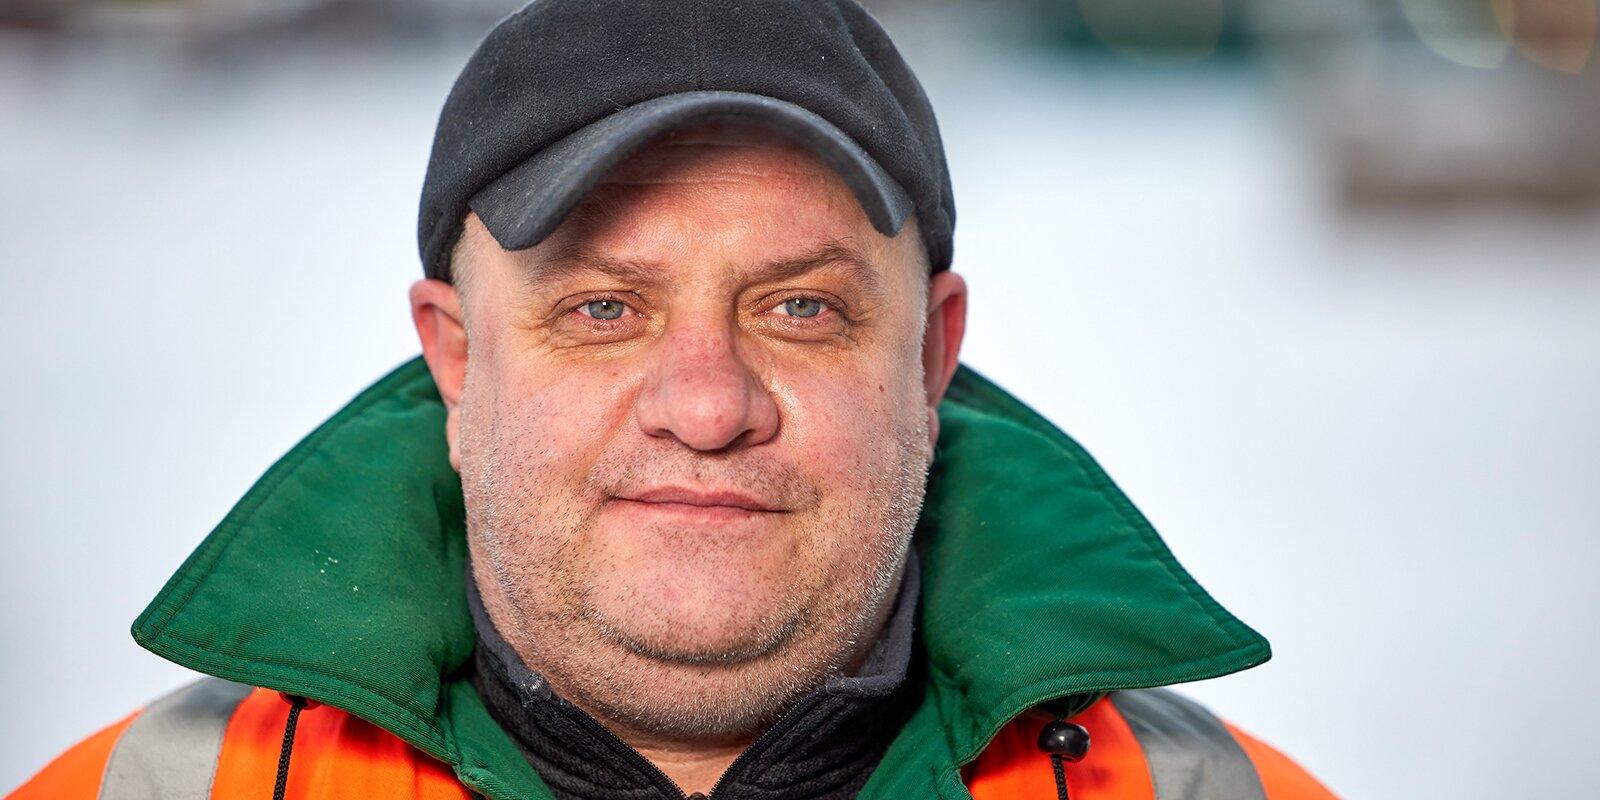 Dmitry Kupriyenko, Deputy Head, Operational Hydro-Technical District No. 1 of Movodostok Effluent Control and Recovery Company. Photo by Maxim Denisov, Mos.ru